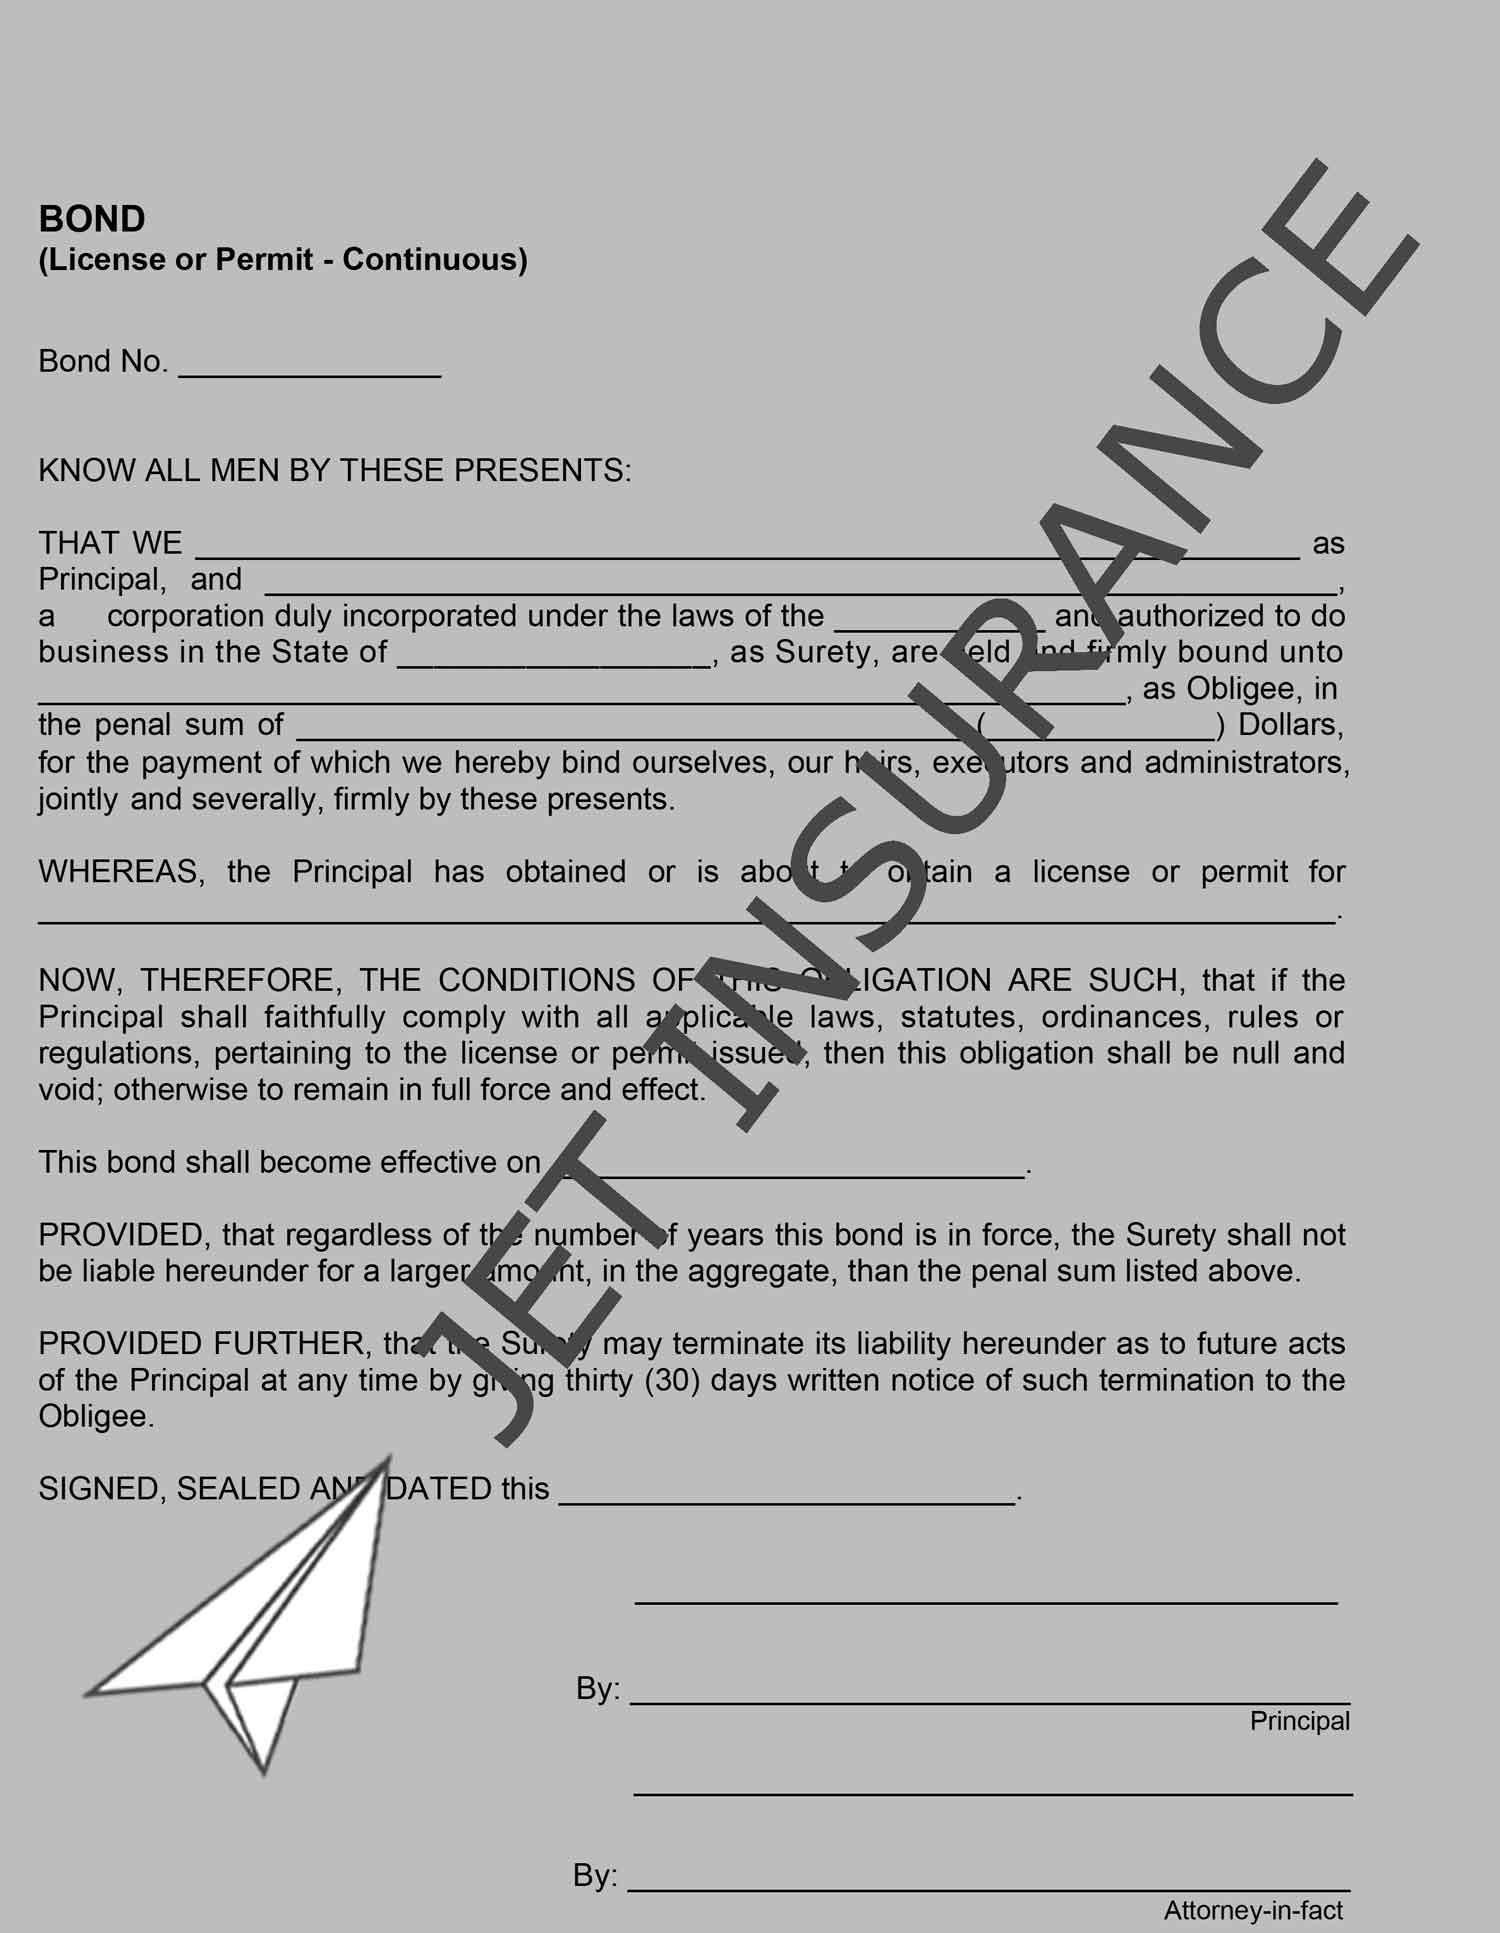 Clark County, Nevada Alarm Installer Bond Form